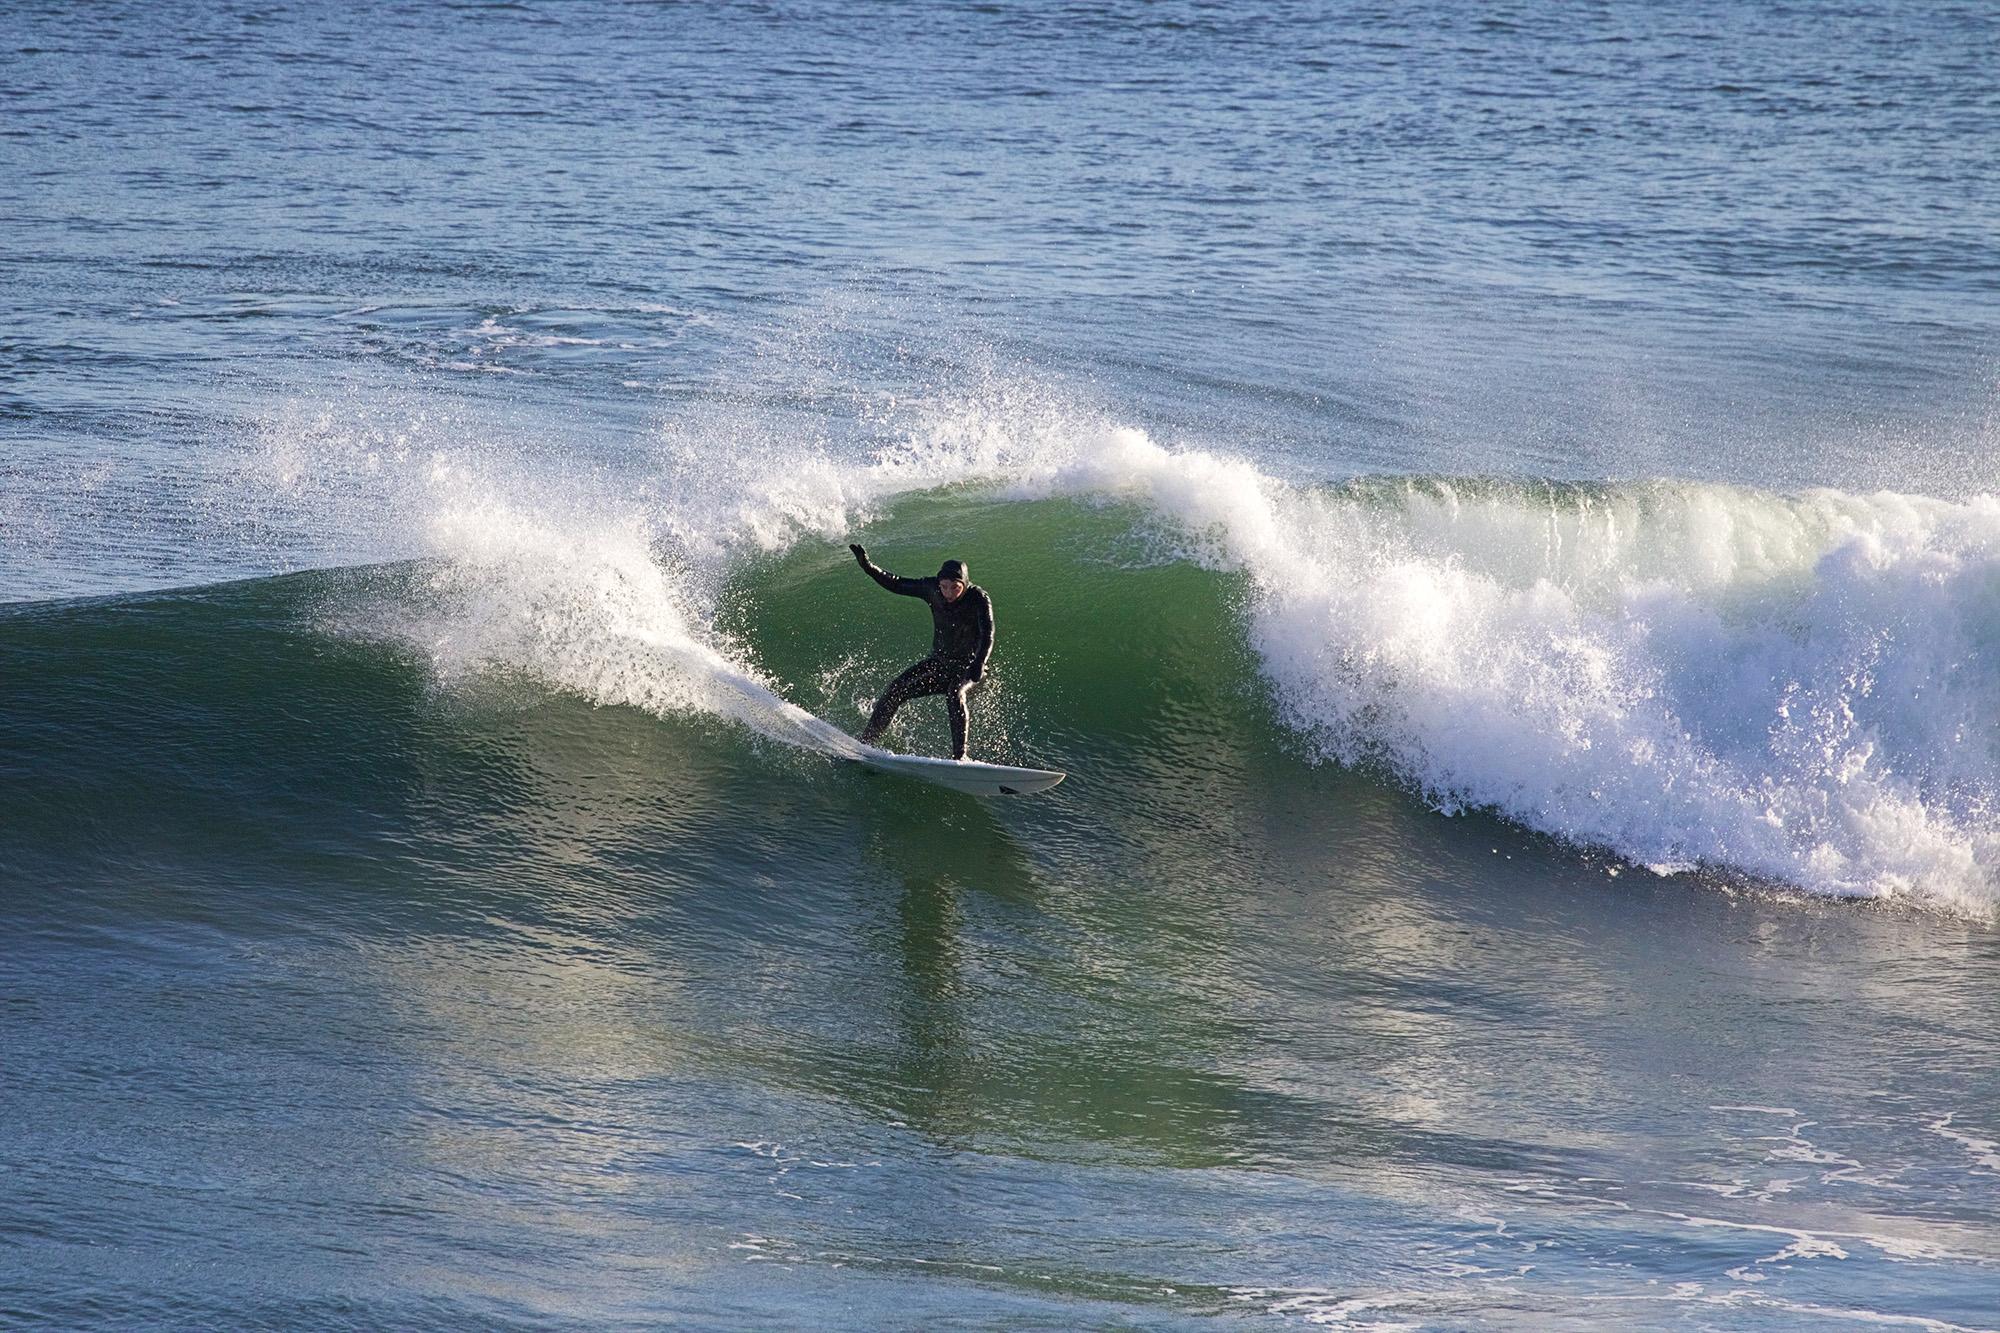 1-19-17 MTK Surfer 29.jpg